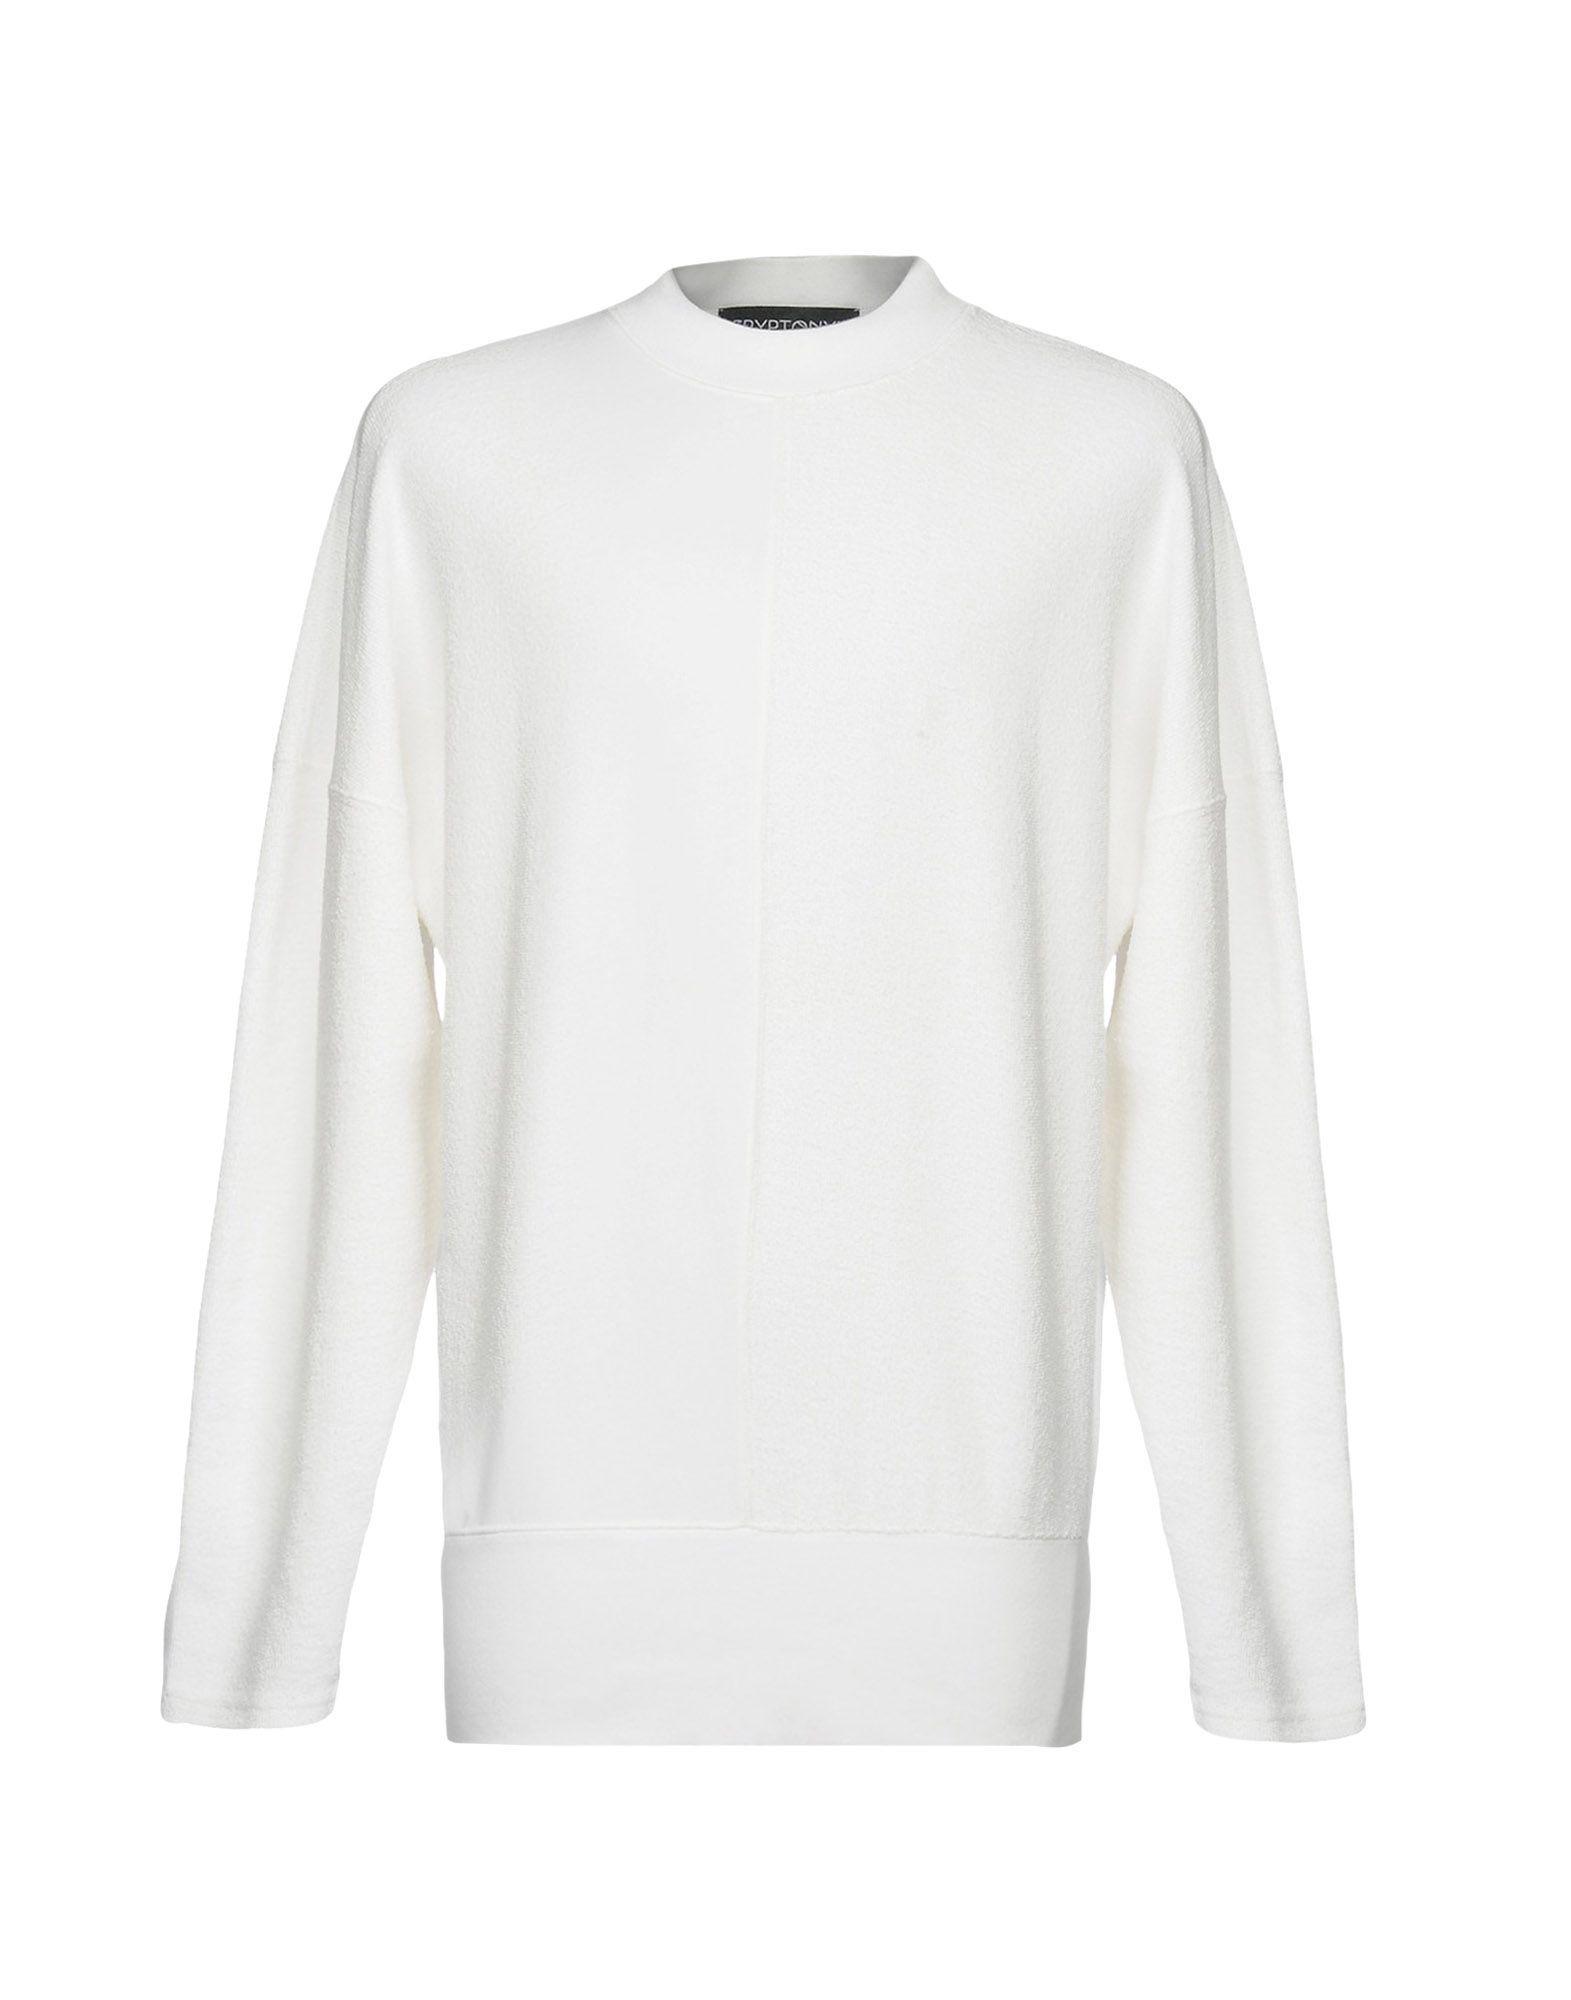 The White For In Sweatshirts Cryptonym Men Lyst dzxWpqHFd